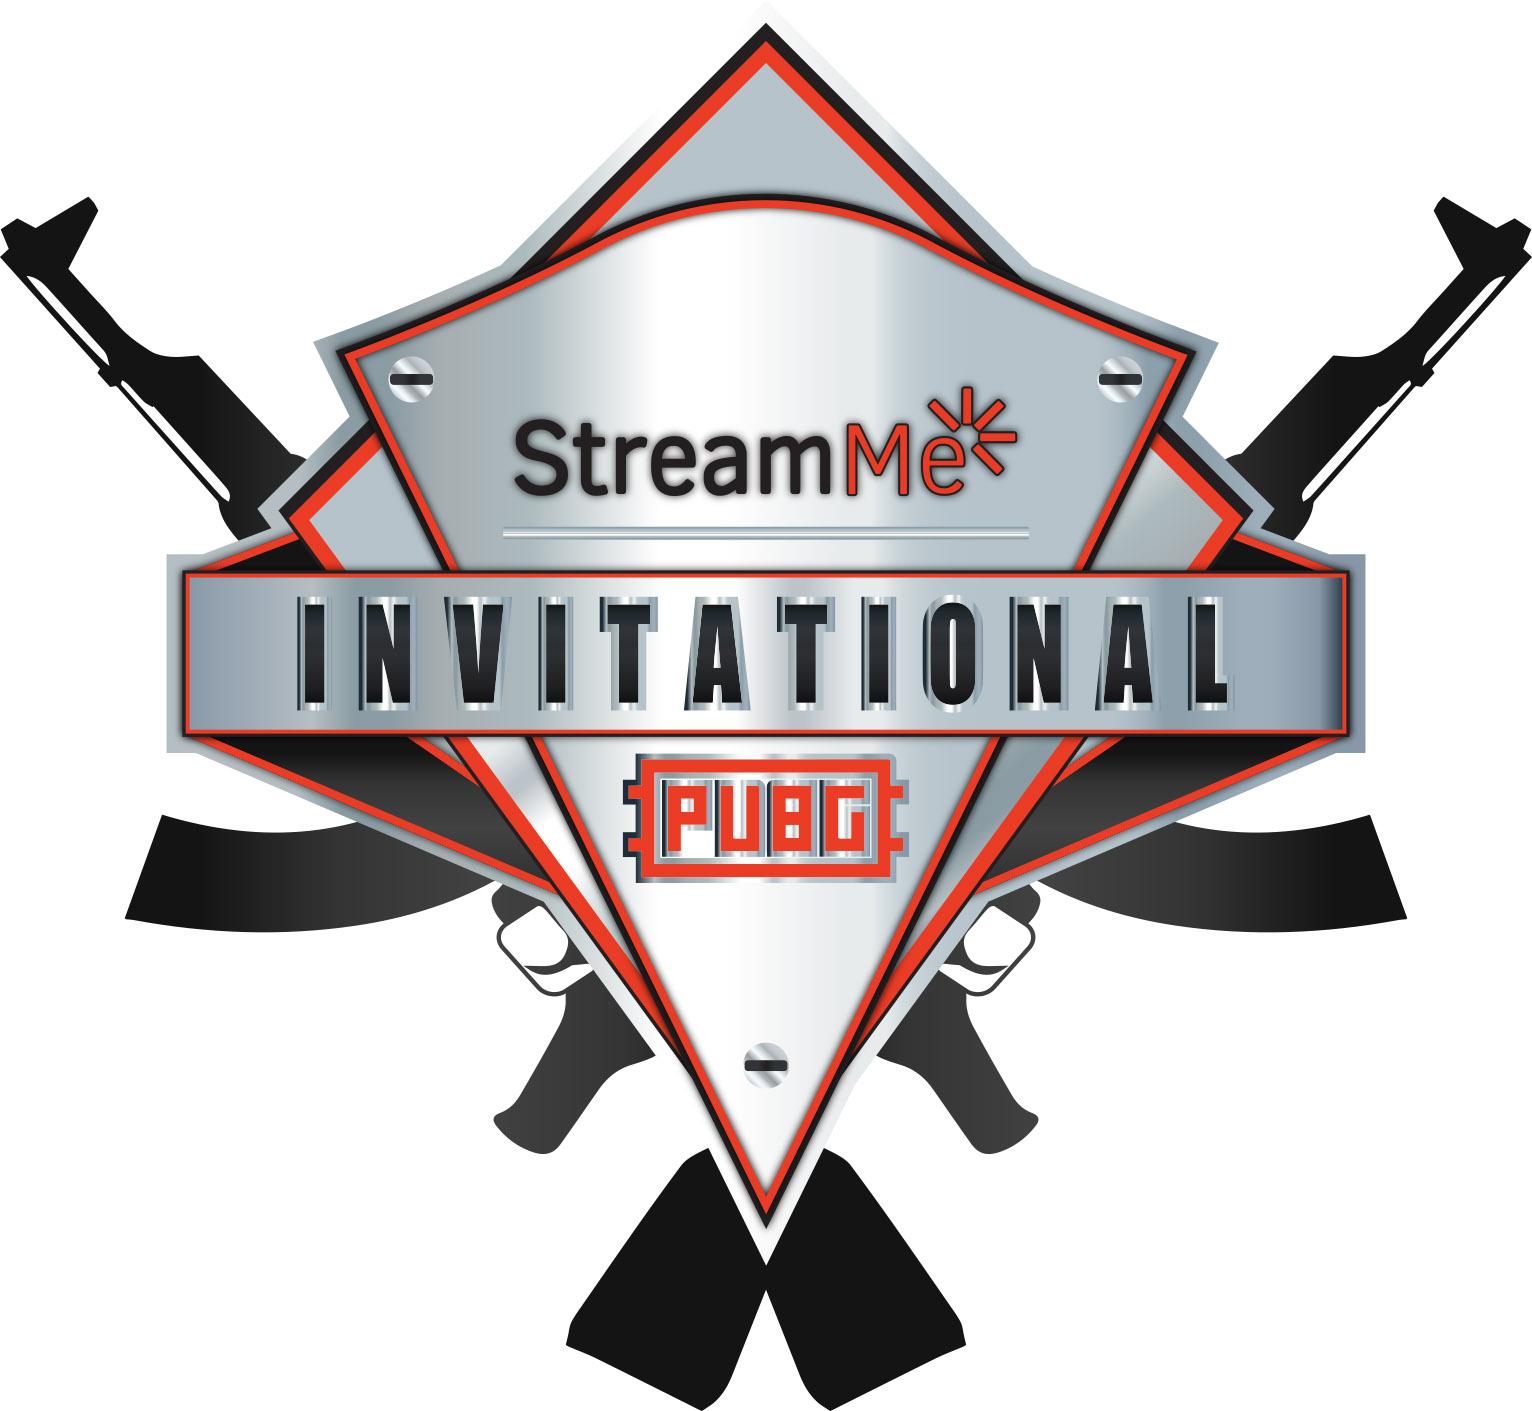 Stream Me Pubg Logo With Guns The Vertical Slice